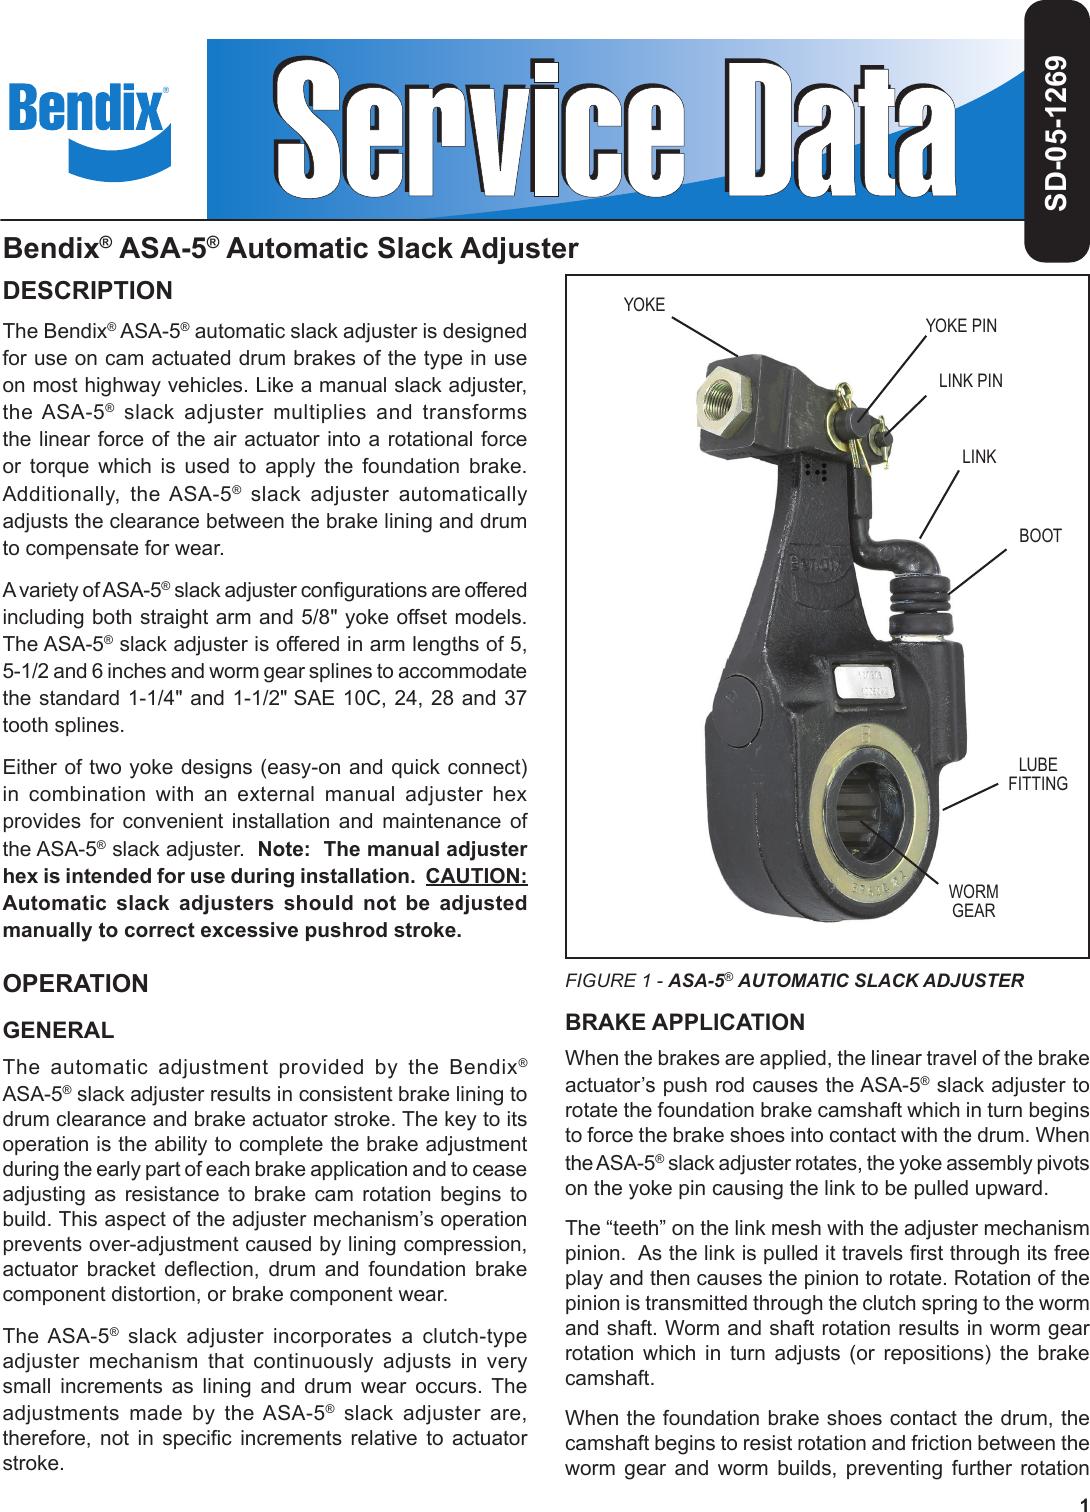 Bendix Bw1602 Users Manual